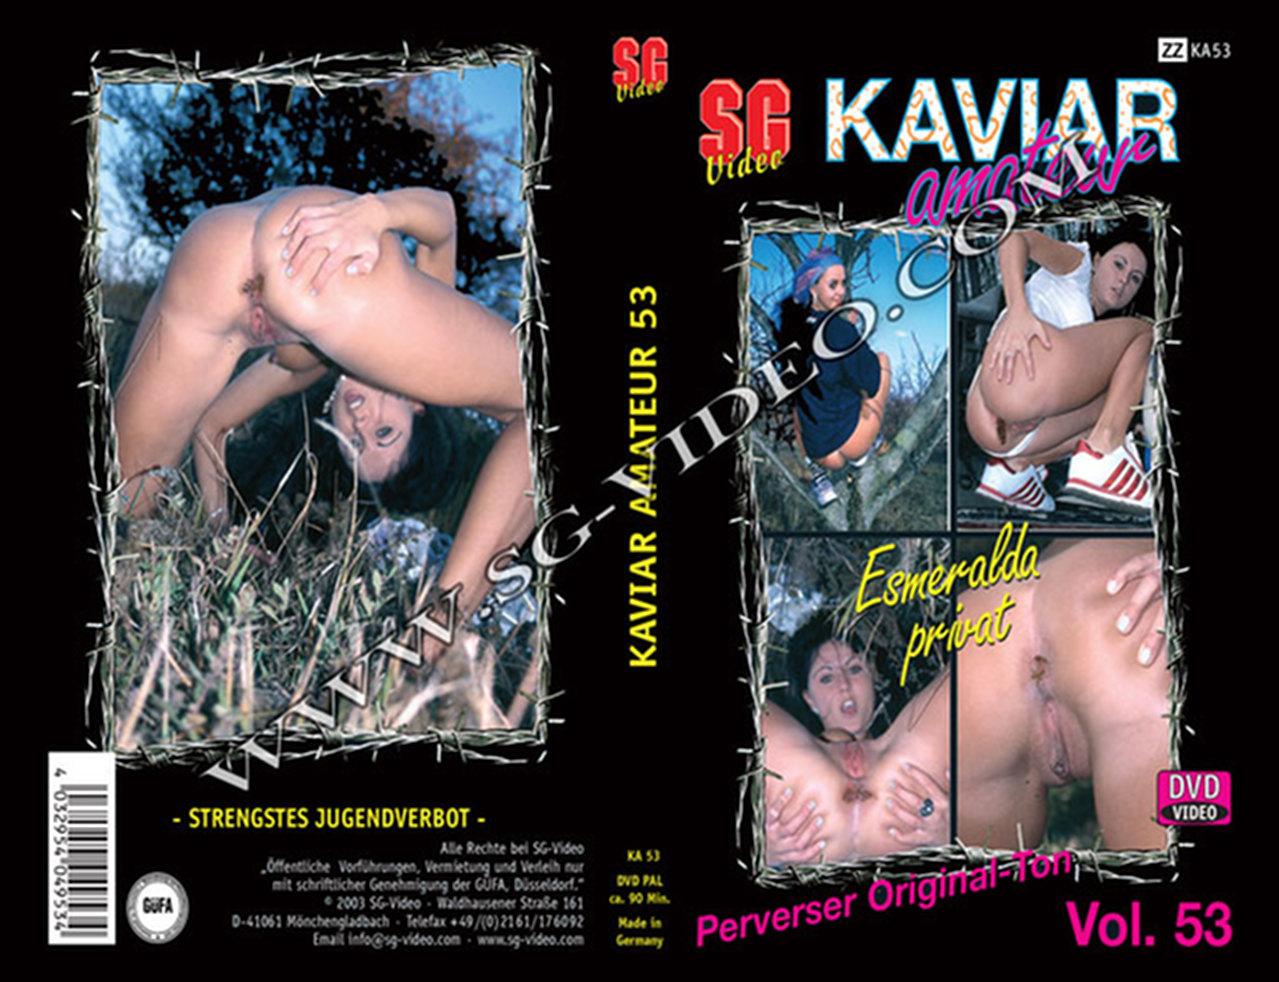 KAVIAR AMATEUR 53 – Esmeralda privat (KA53)